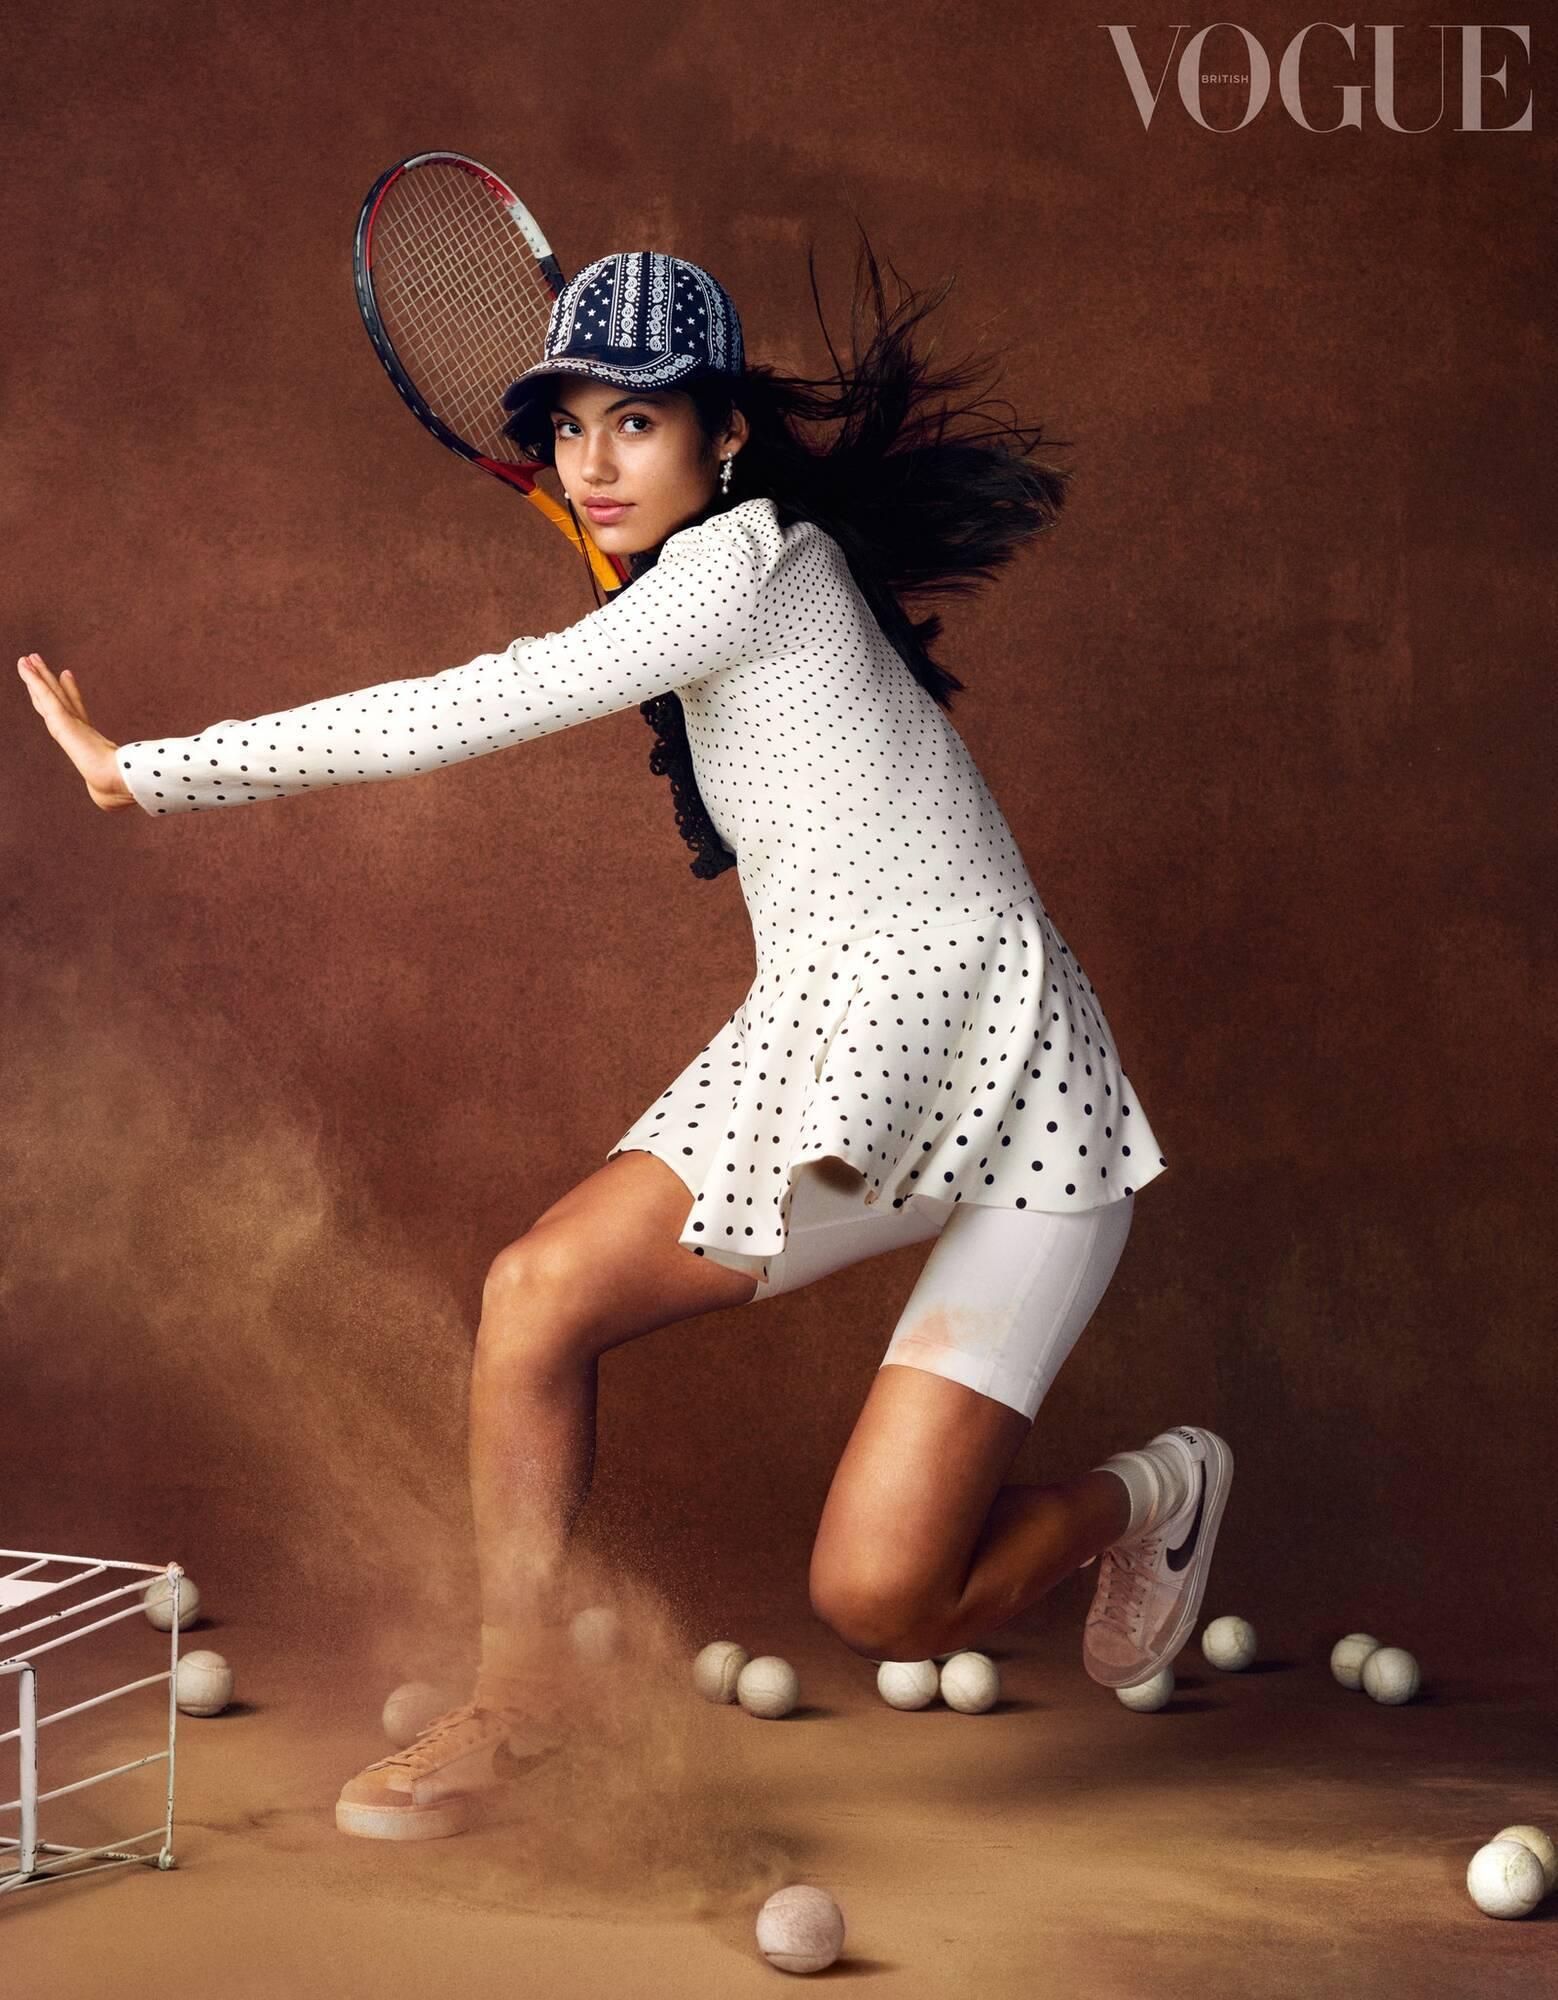 Эмма Радукану вышла в четвертьфинал US Open